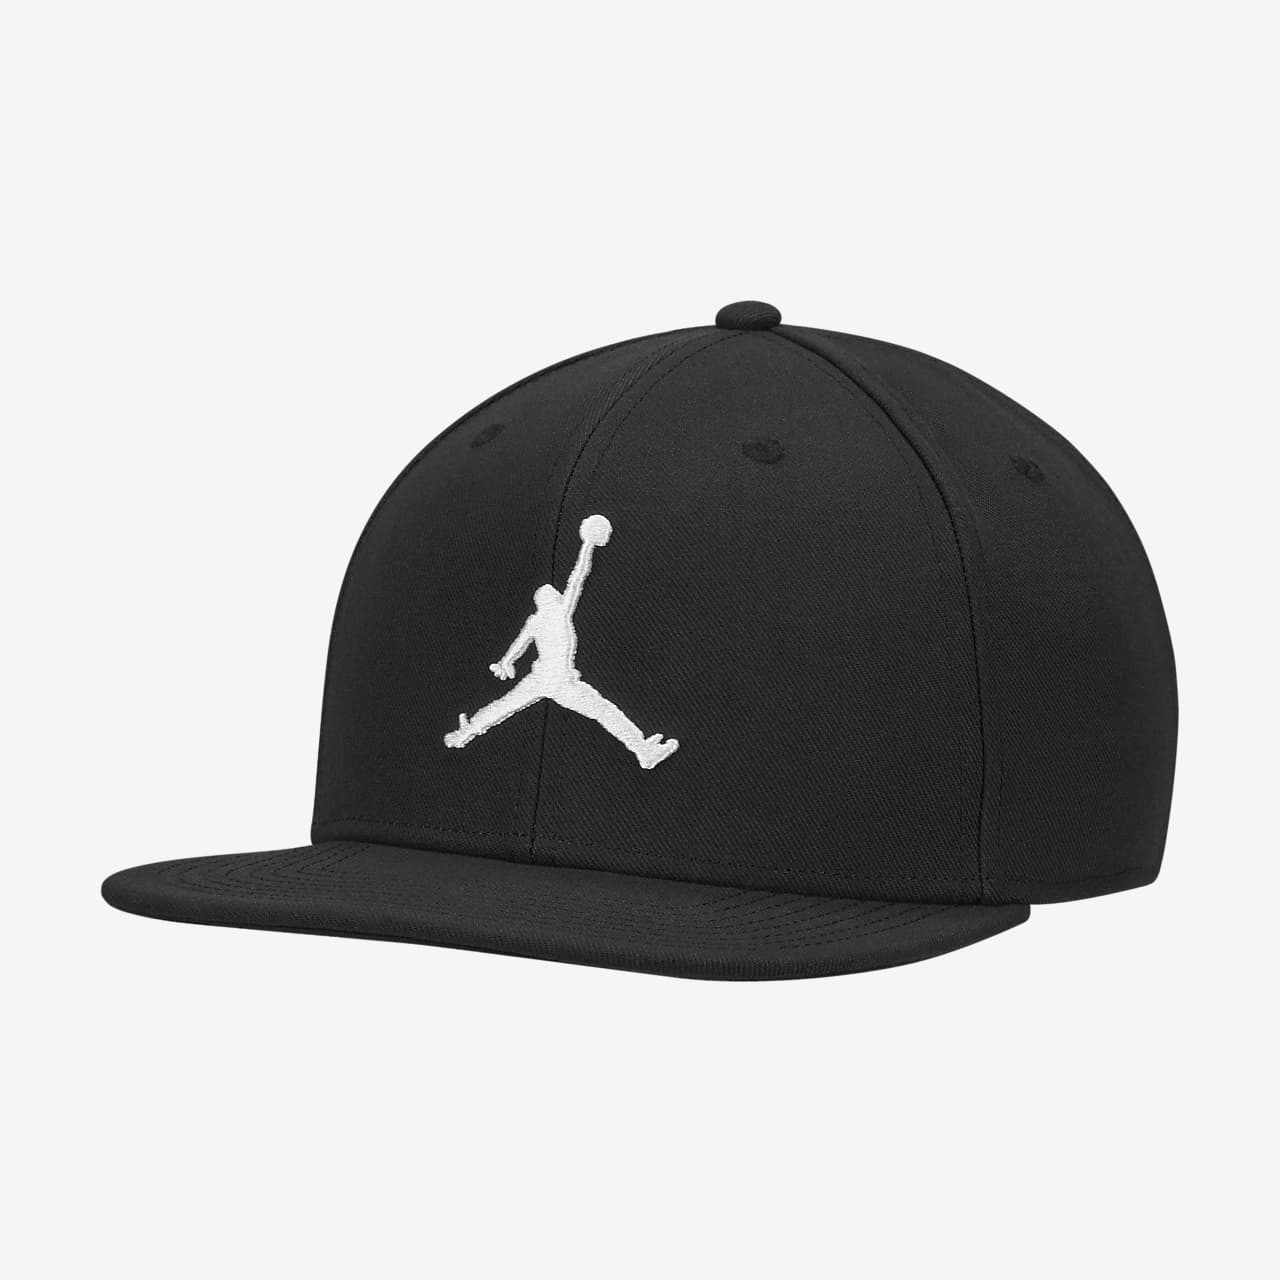 Género Inadecuado crear  Jordan Pro Jumpman Snapback Hat. Nike AU